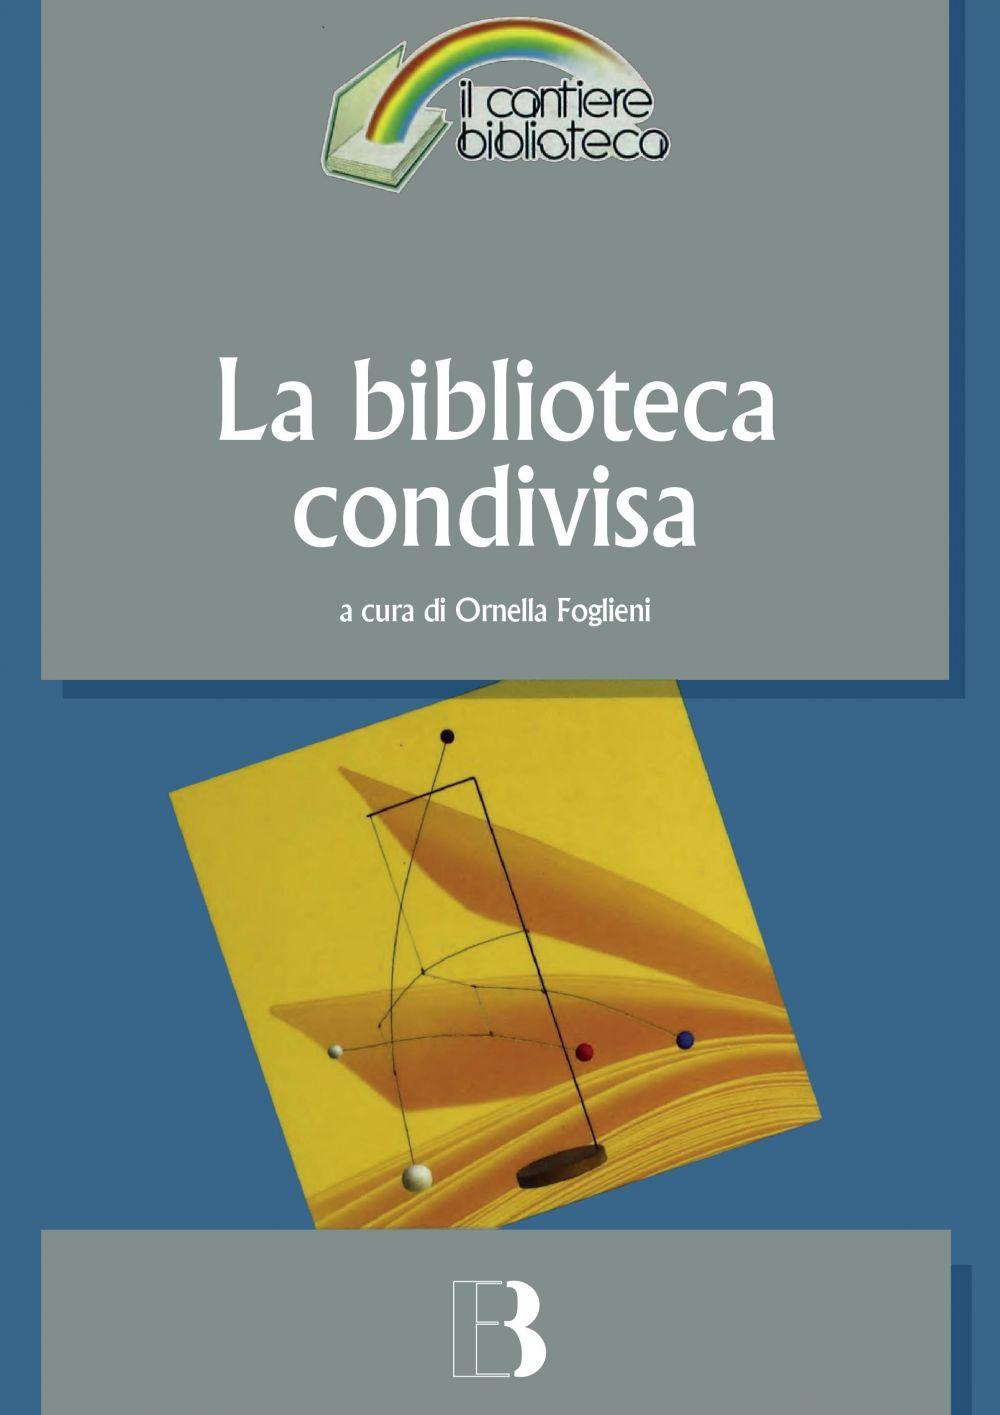 La biblioteca condivisa